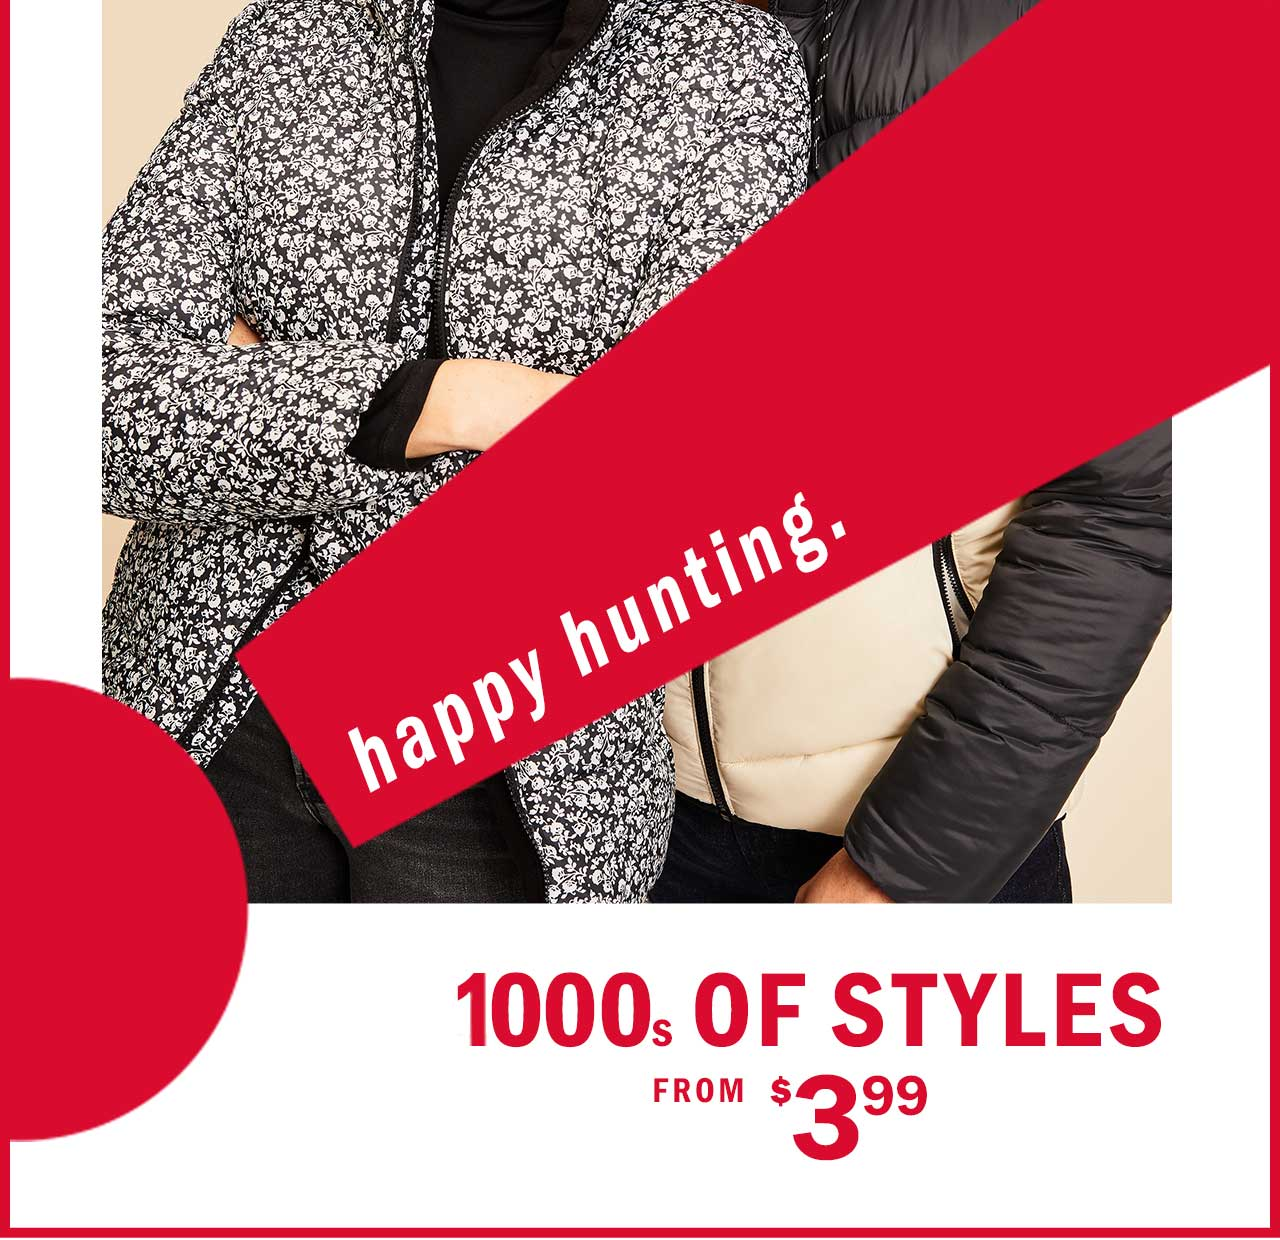 Happy hunting.